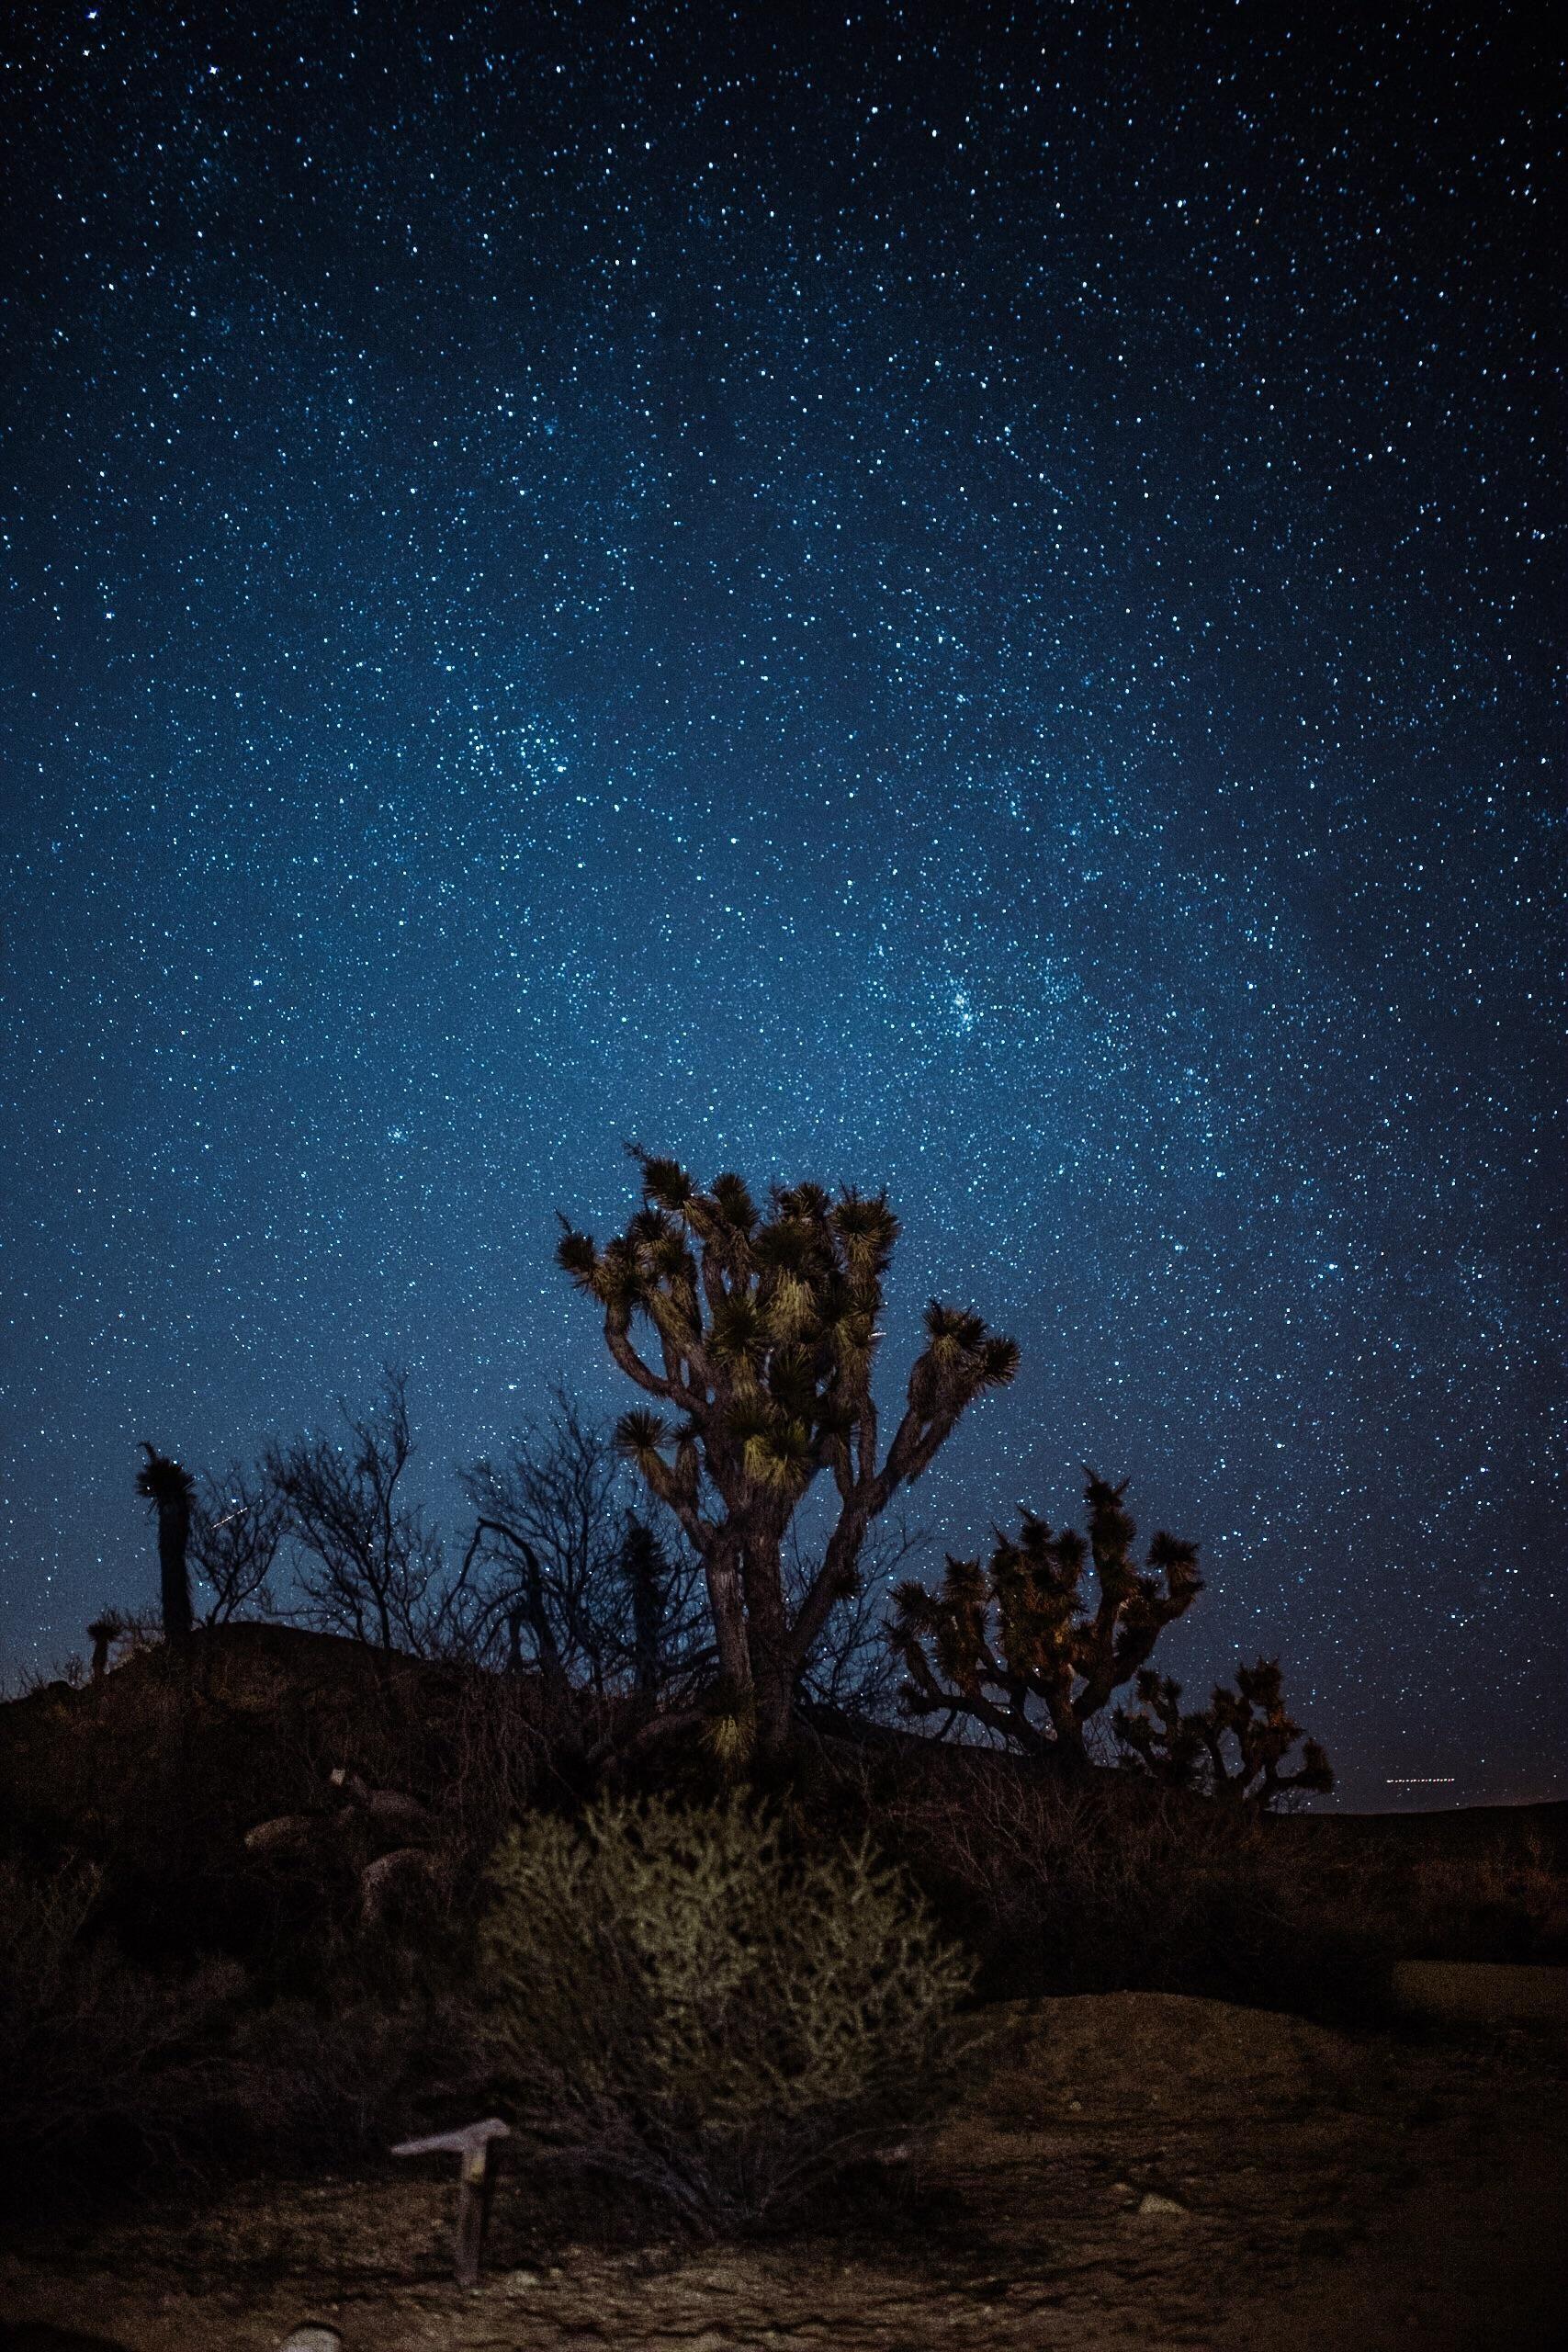 Starry Night In Joshua Tree Ca Joshua Tree Joshua Tree National Park Sky Pictures Cactus trees night starry sky wallpaper